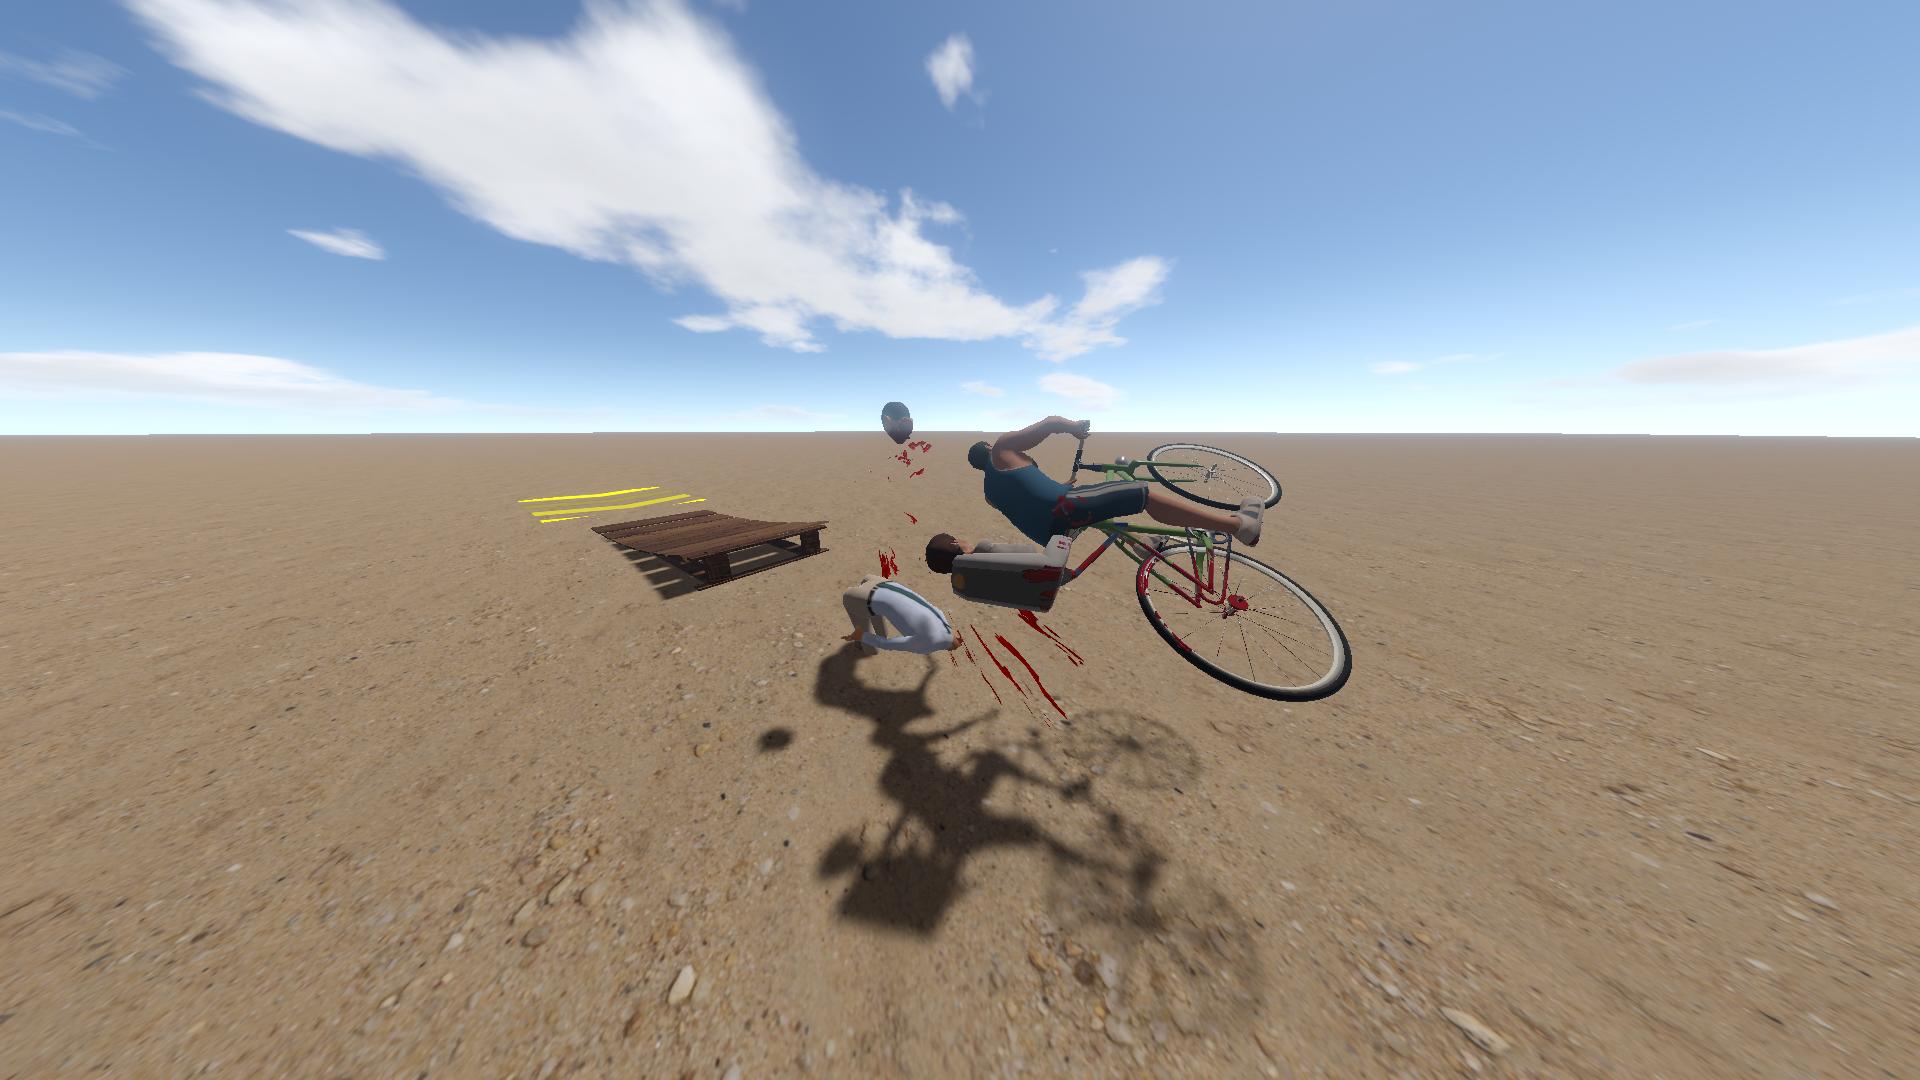 Bicicyle Beheading